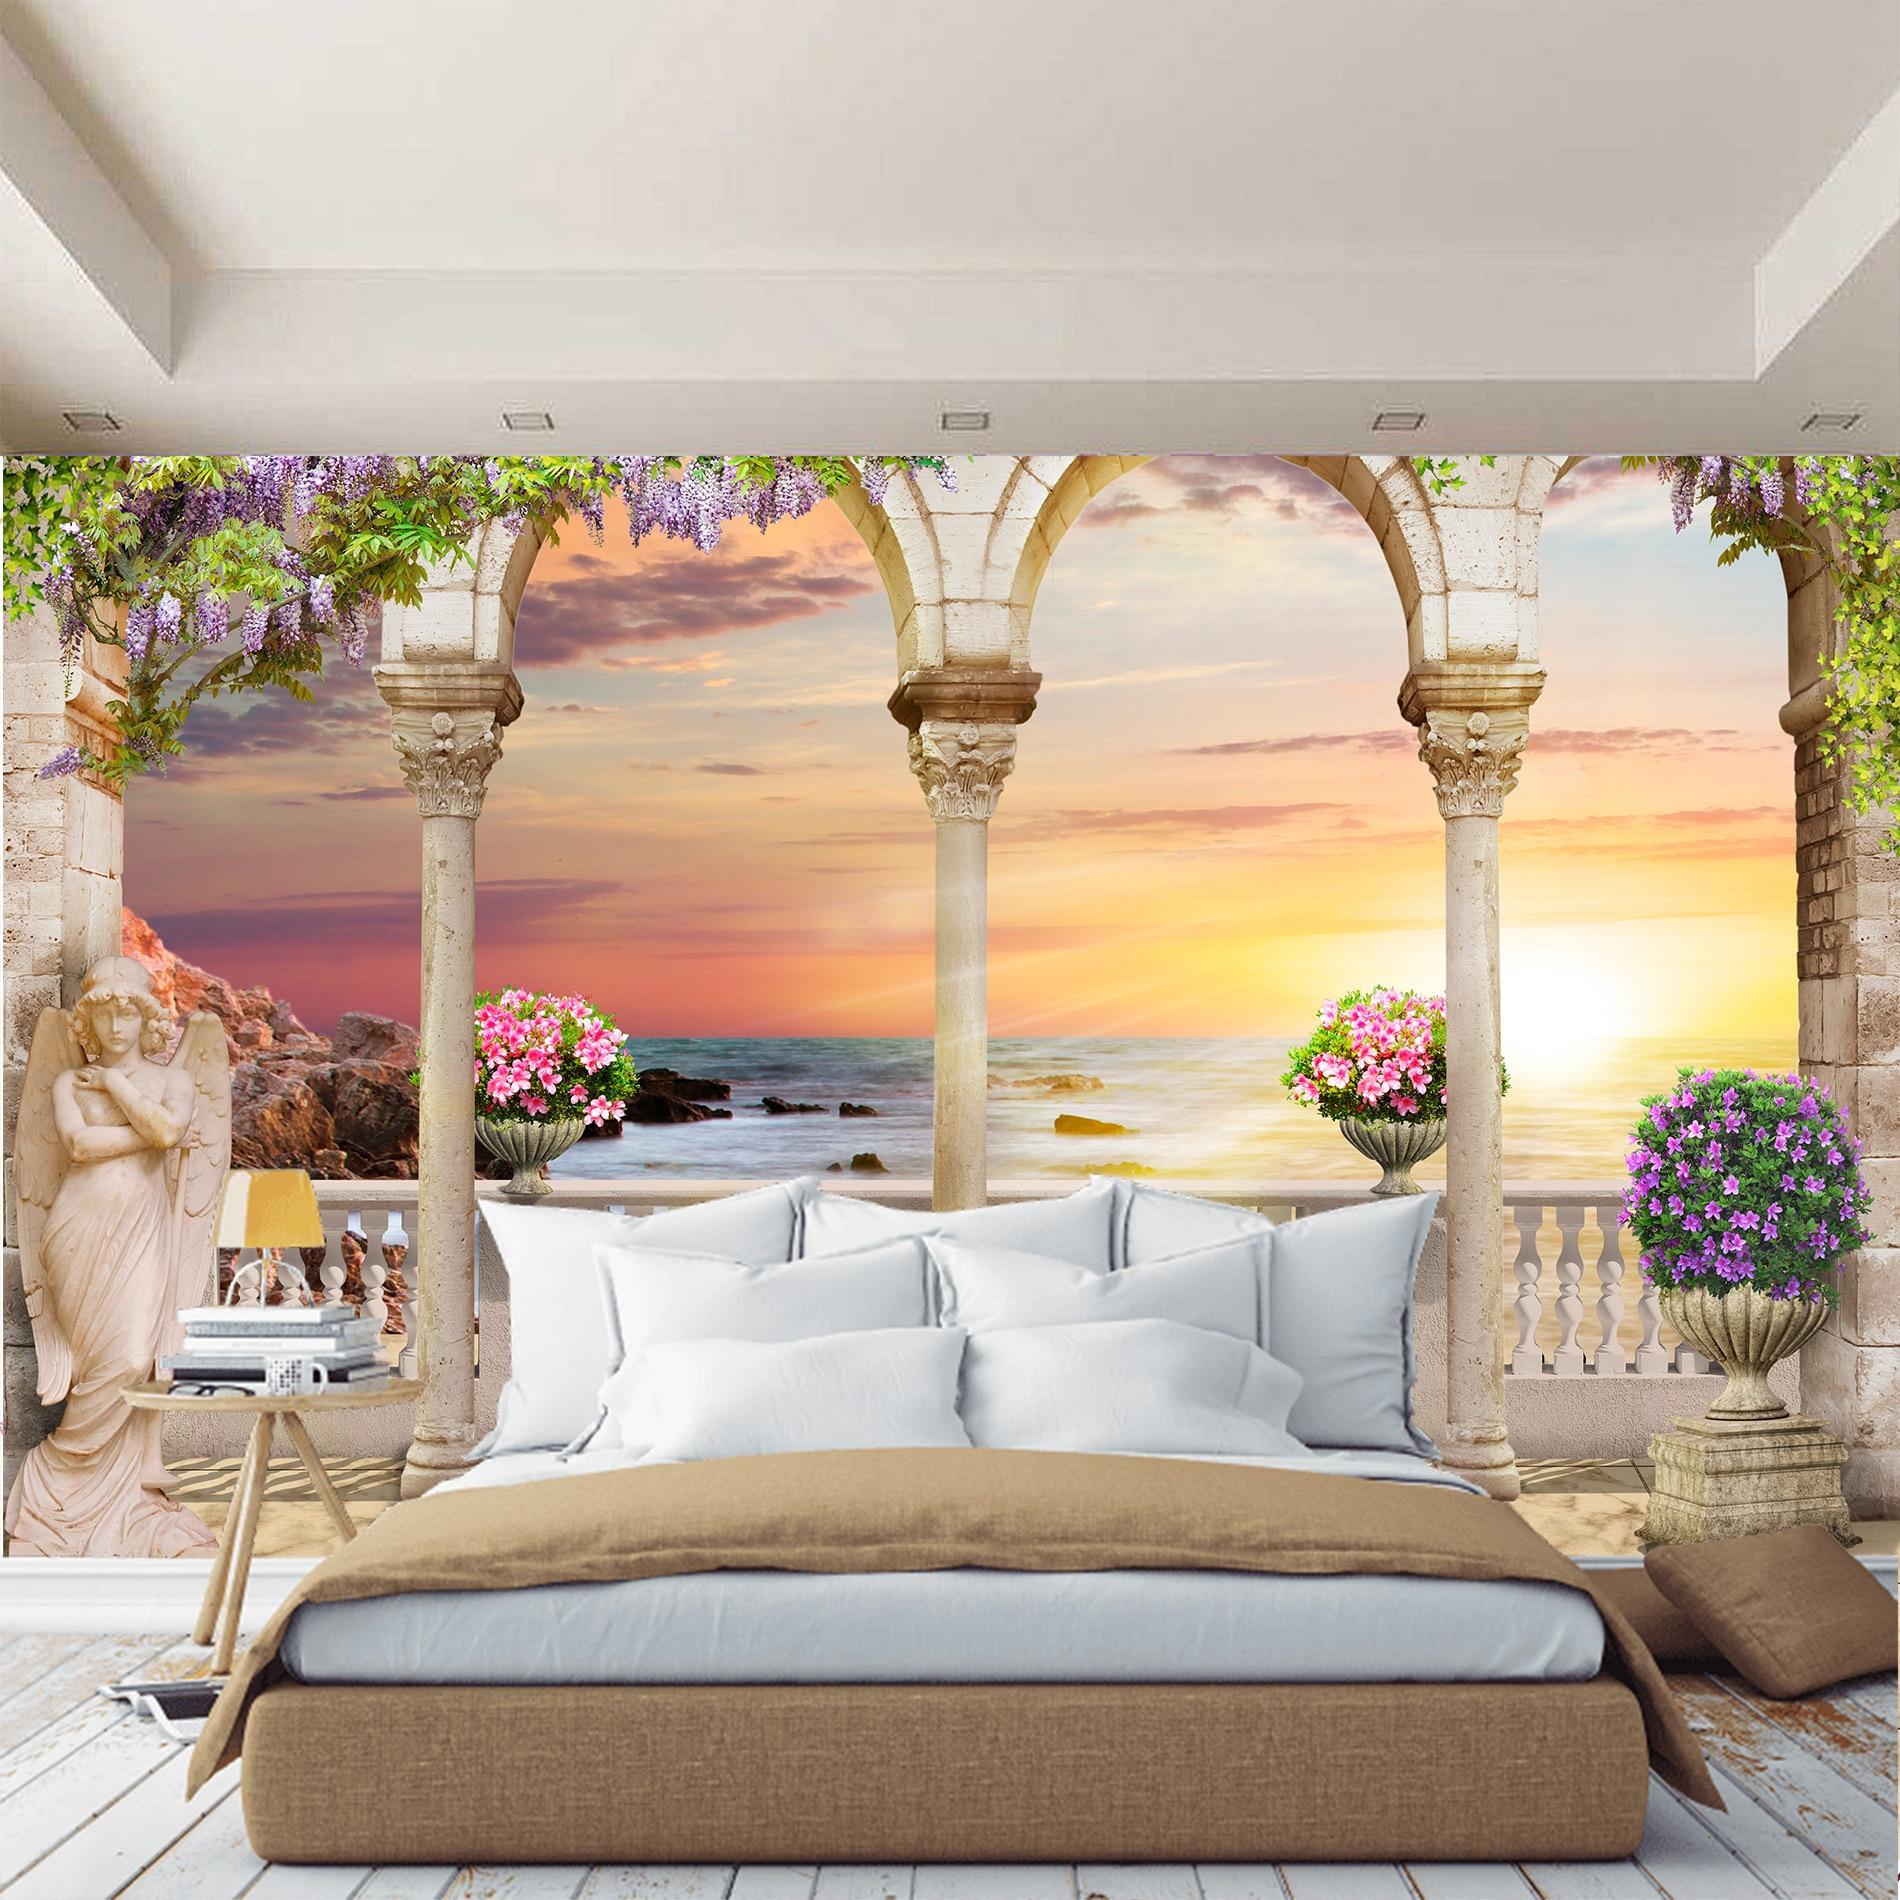 Murals Columns 3D Wall Mural, Wallpaper For Hall, Kitchen, Bedroom, Murals Expanding Space